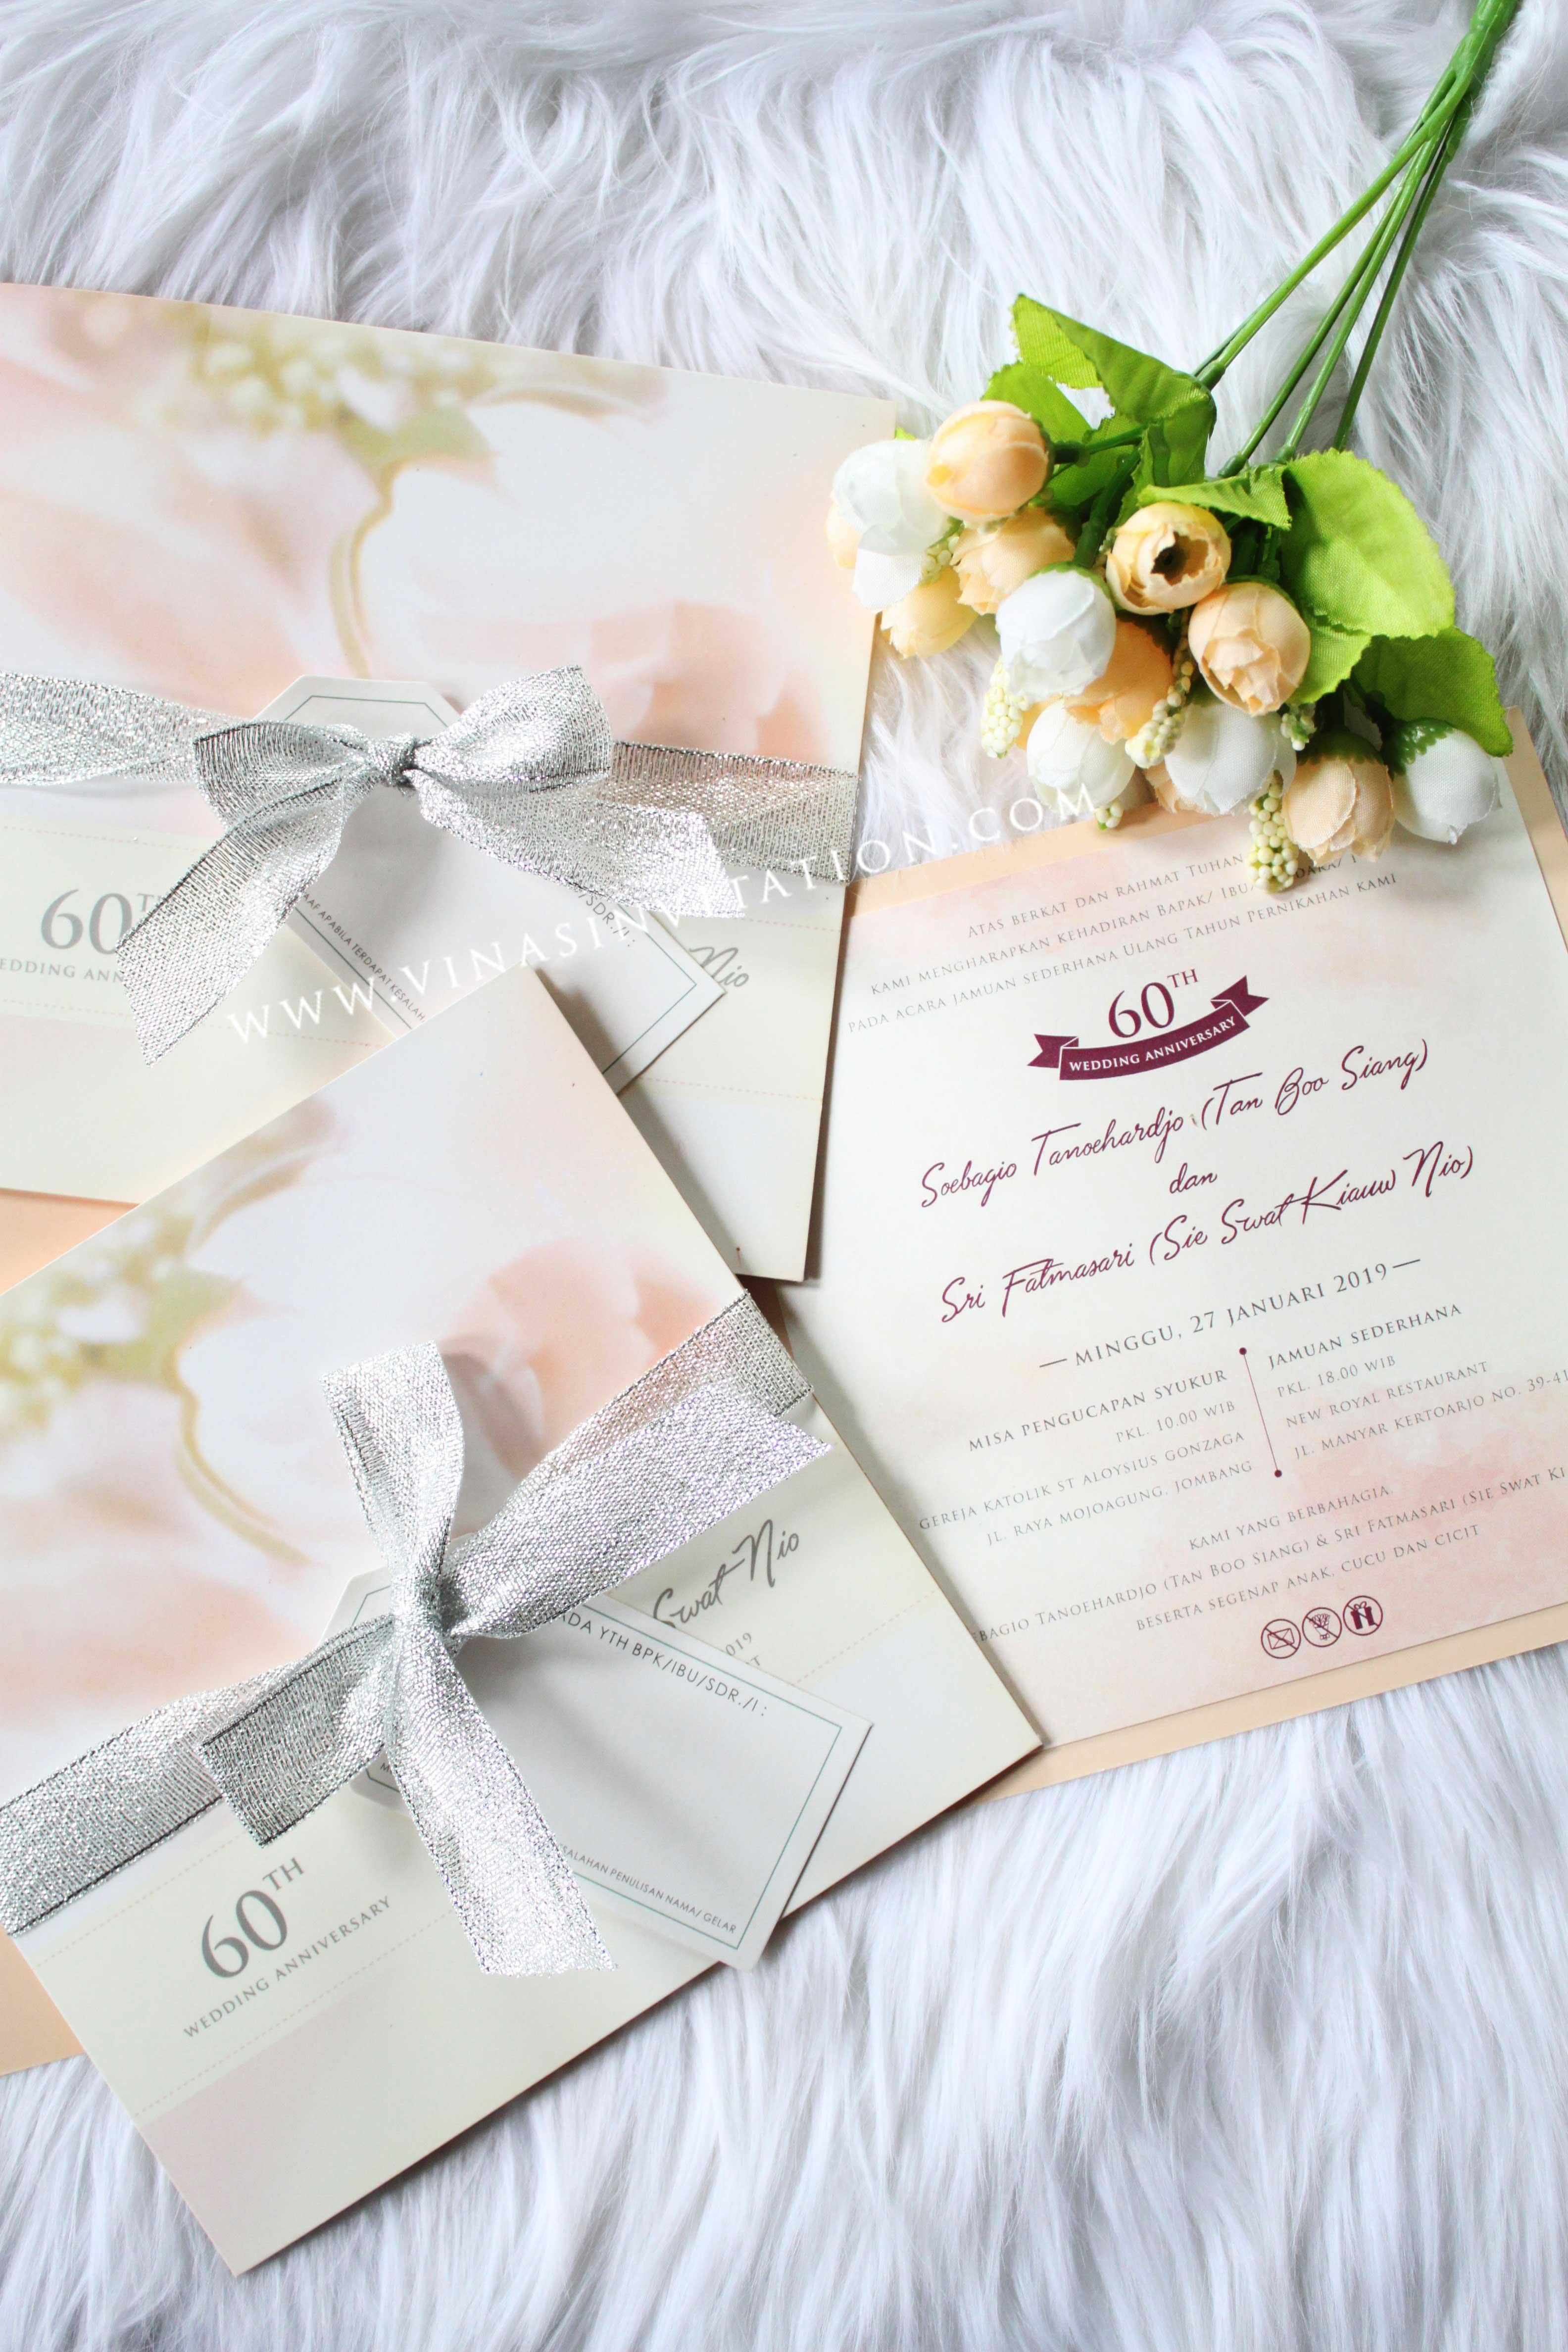 Soebagio Fatma Wedding Anniversary By Vinas Invitation